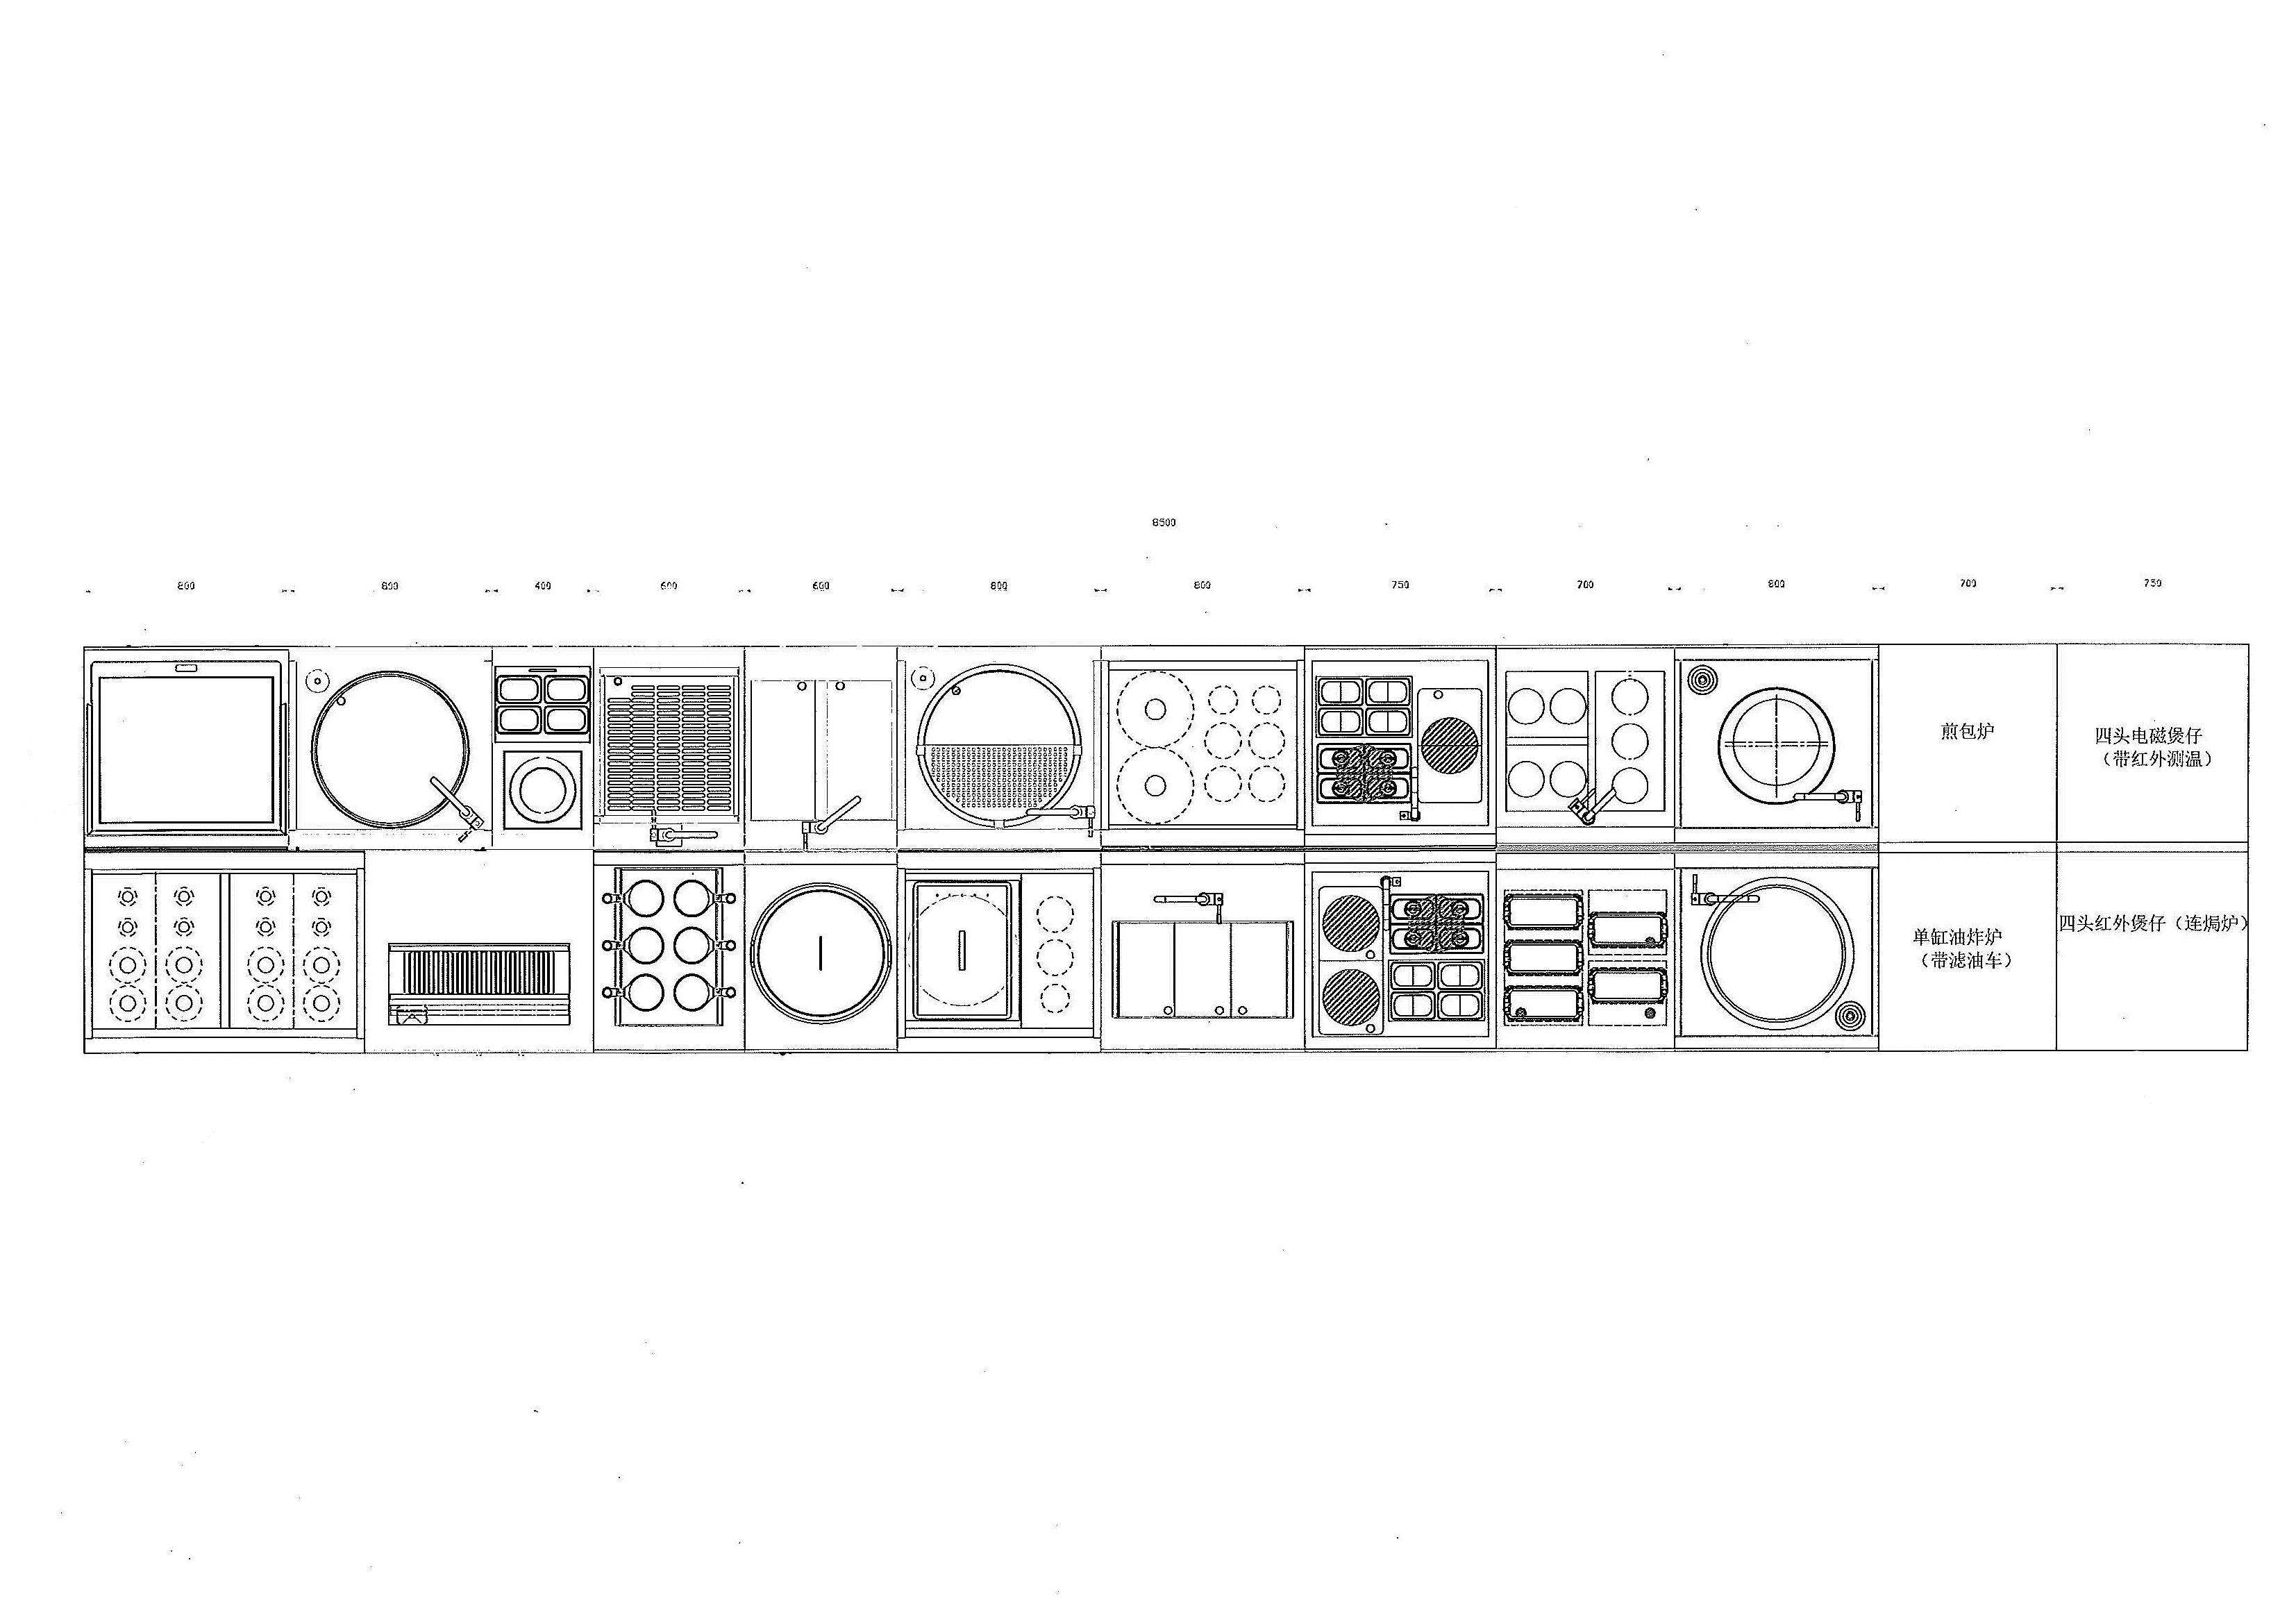 Services Mantru e All Electric mercial Kitchen Equipment